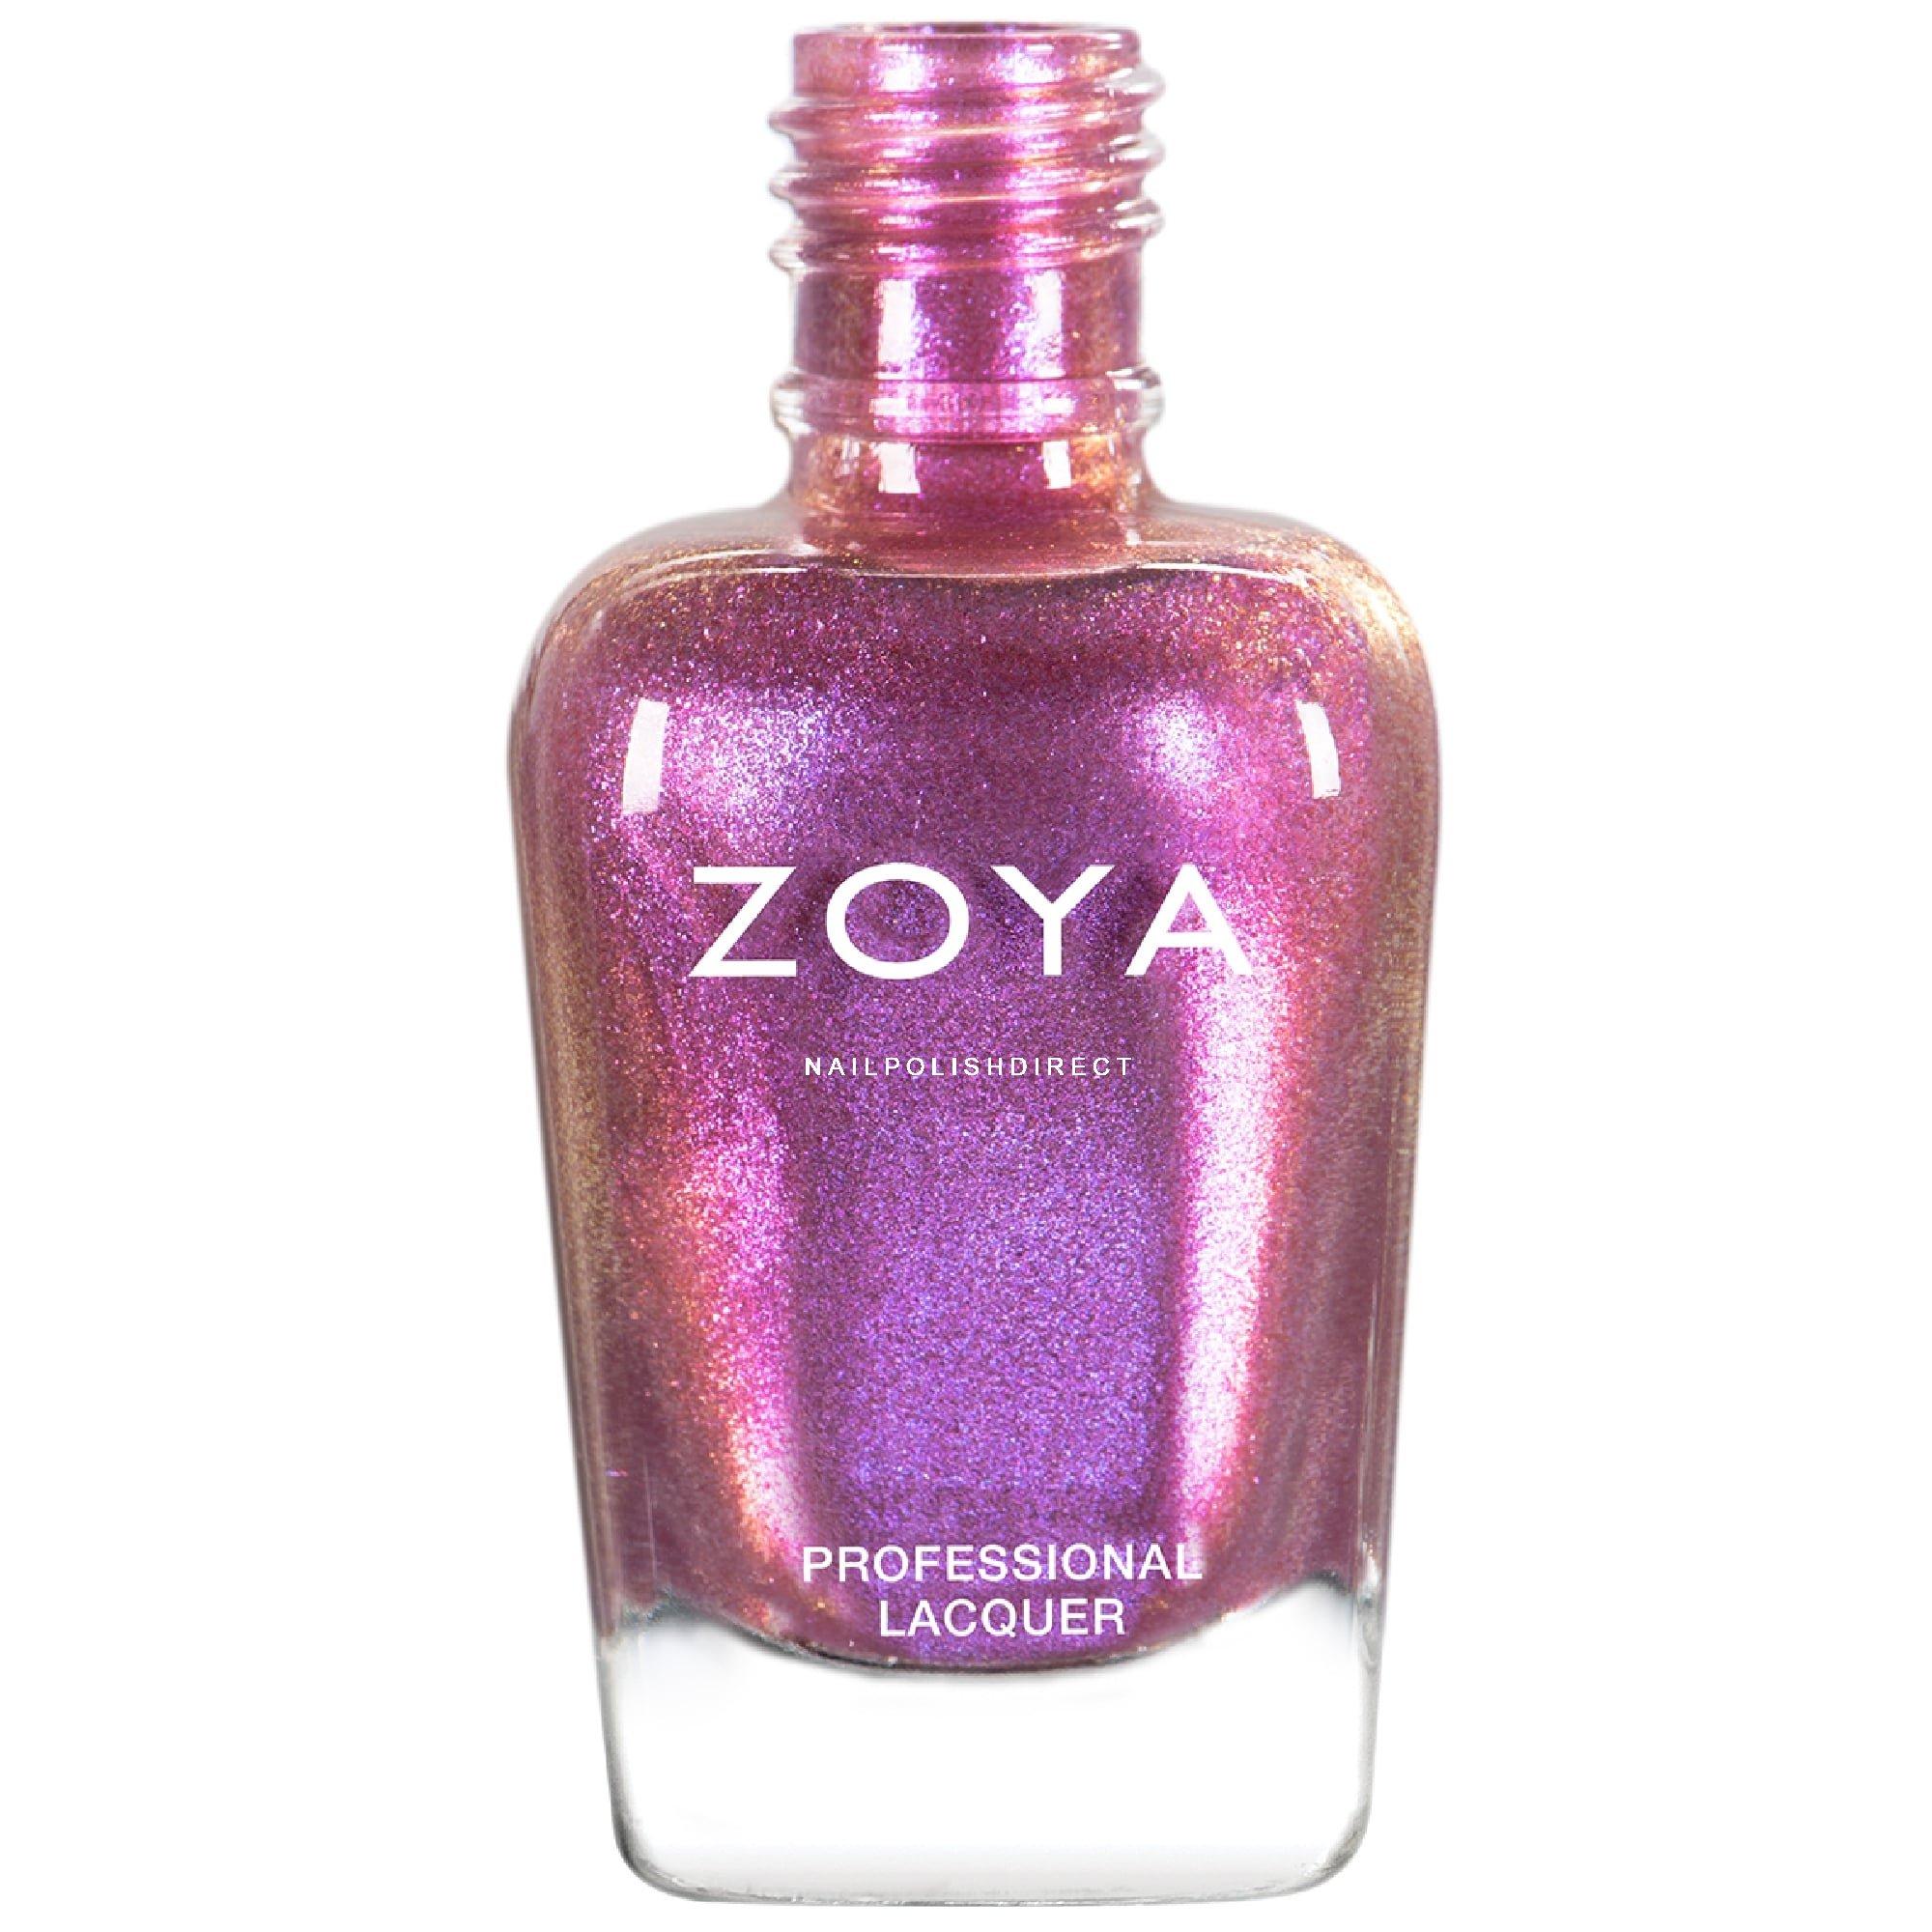 Zoya Thrive 2018 Nail Polish Collection